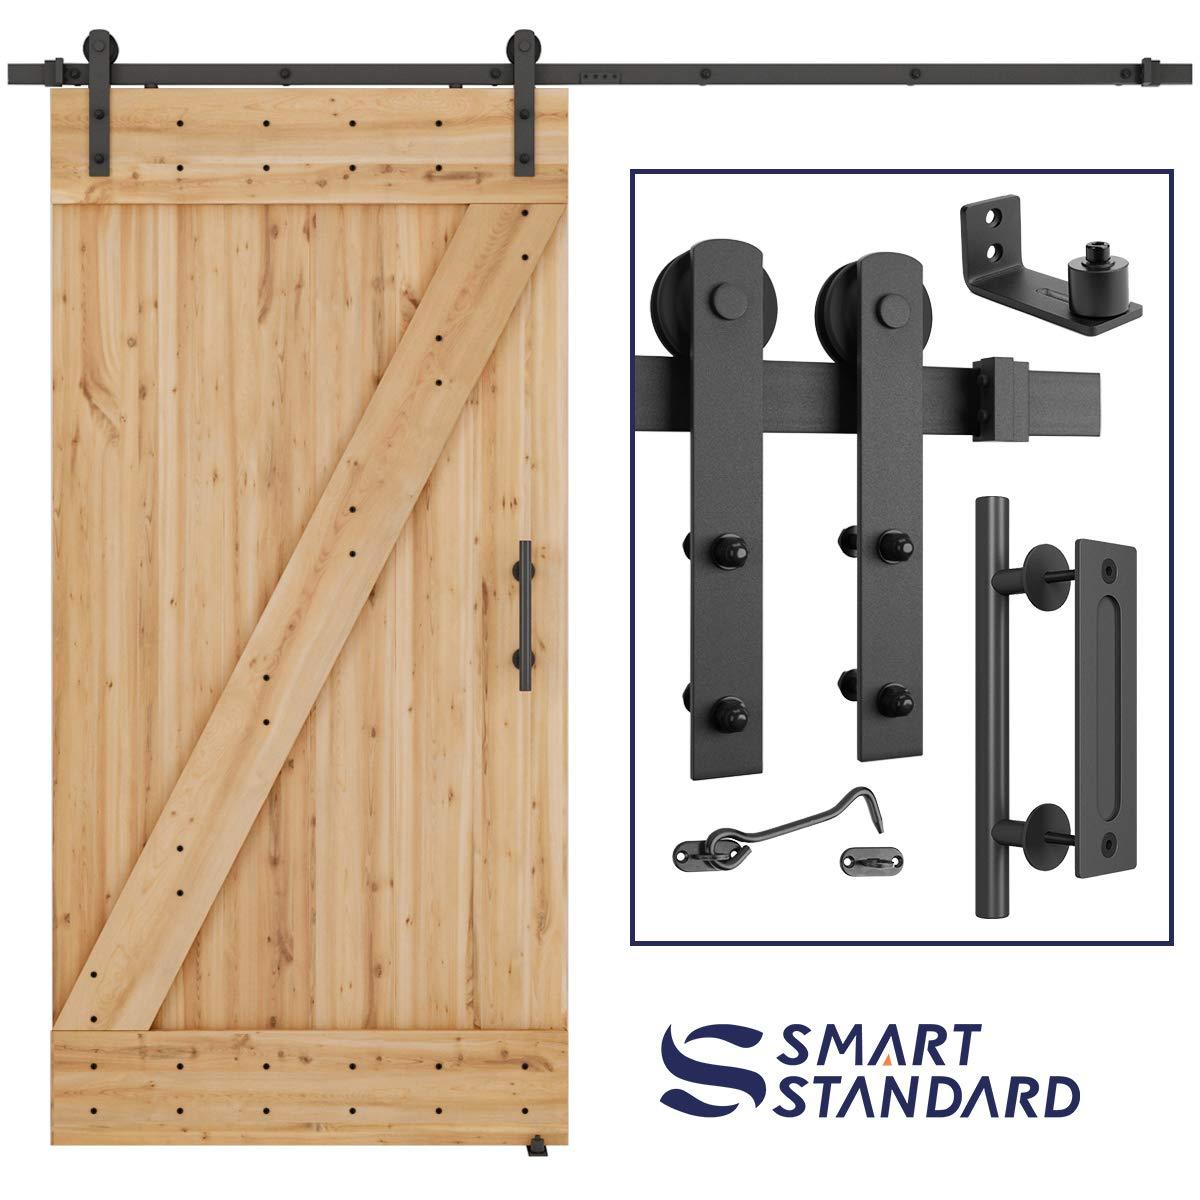 8 FT Heavy Duty Sturdy Sliding Barn Door Hardware Kit, 8ft Double Rail, Black, (Whole Set Includes 1x Pull Handle Set & 1x Floor Guide & 1x Latch Lock) Fit 42''- 48'' Wide Door Panel (I Shape Hanger)